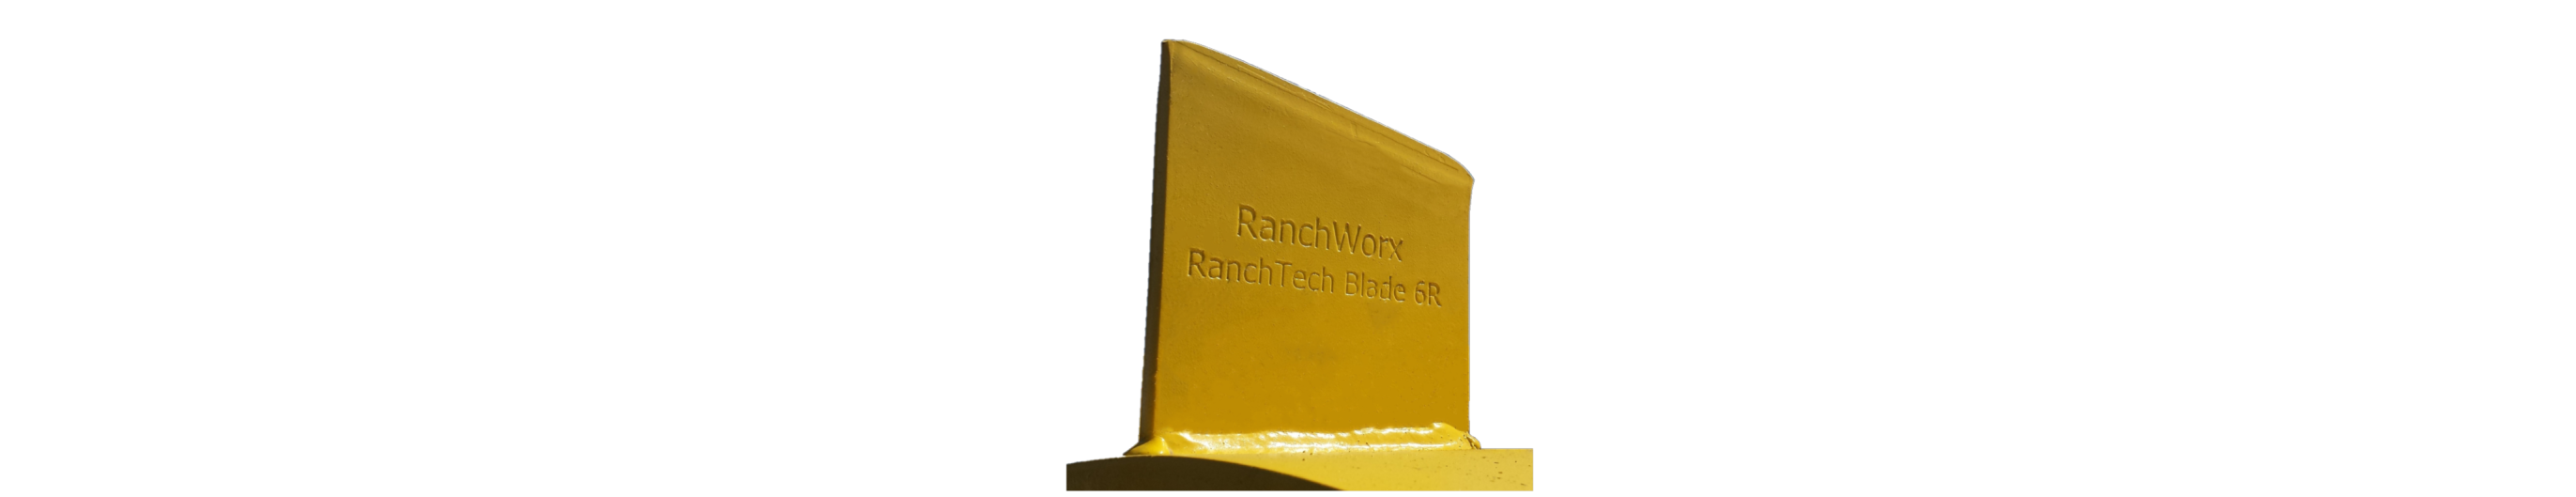 ranchworx ranchtech blade lifetime warranty